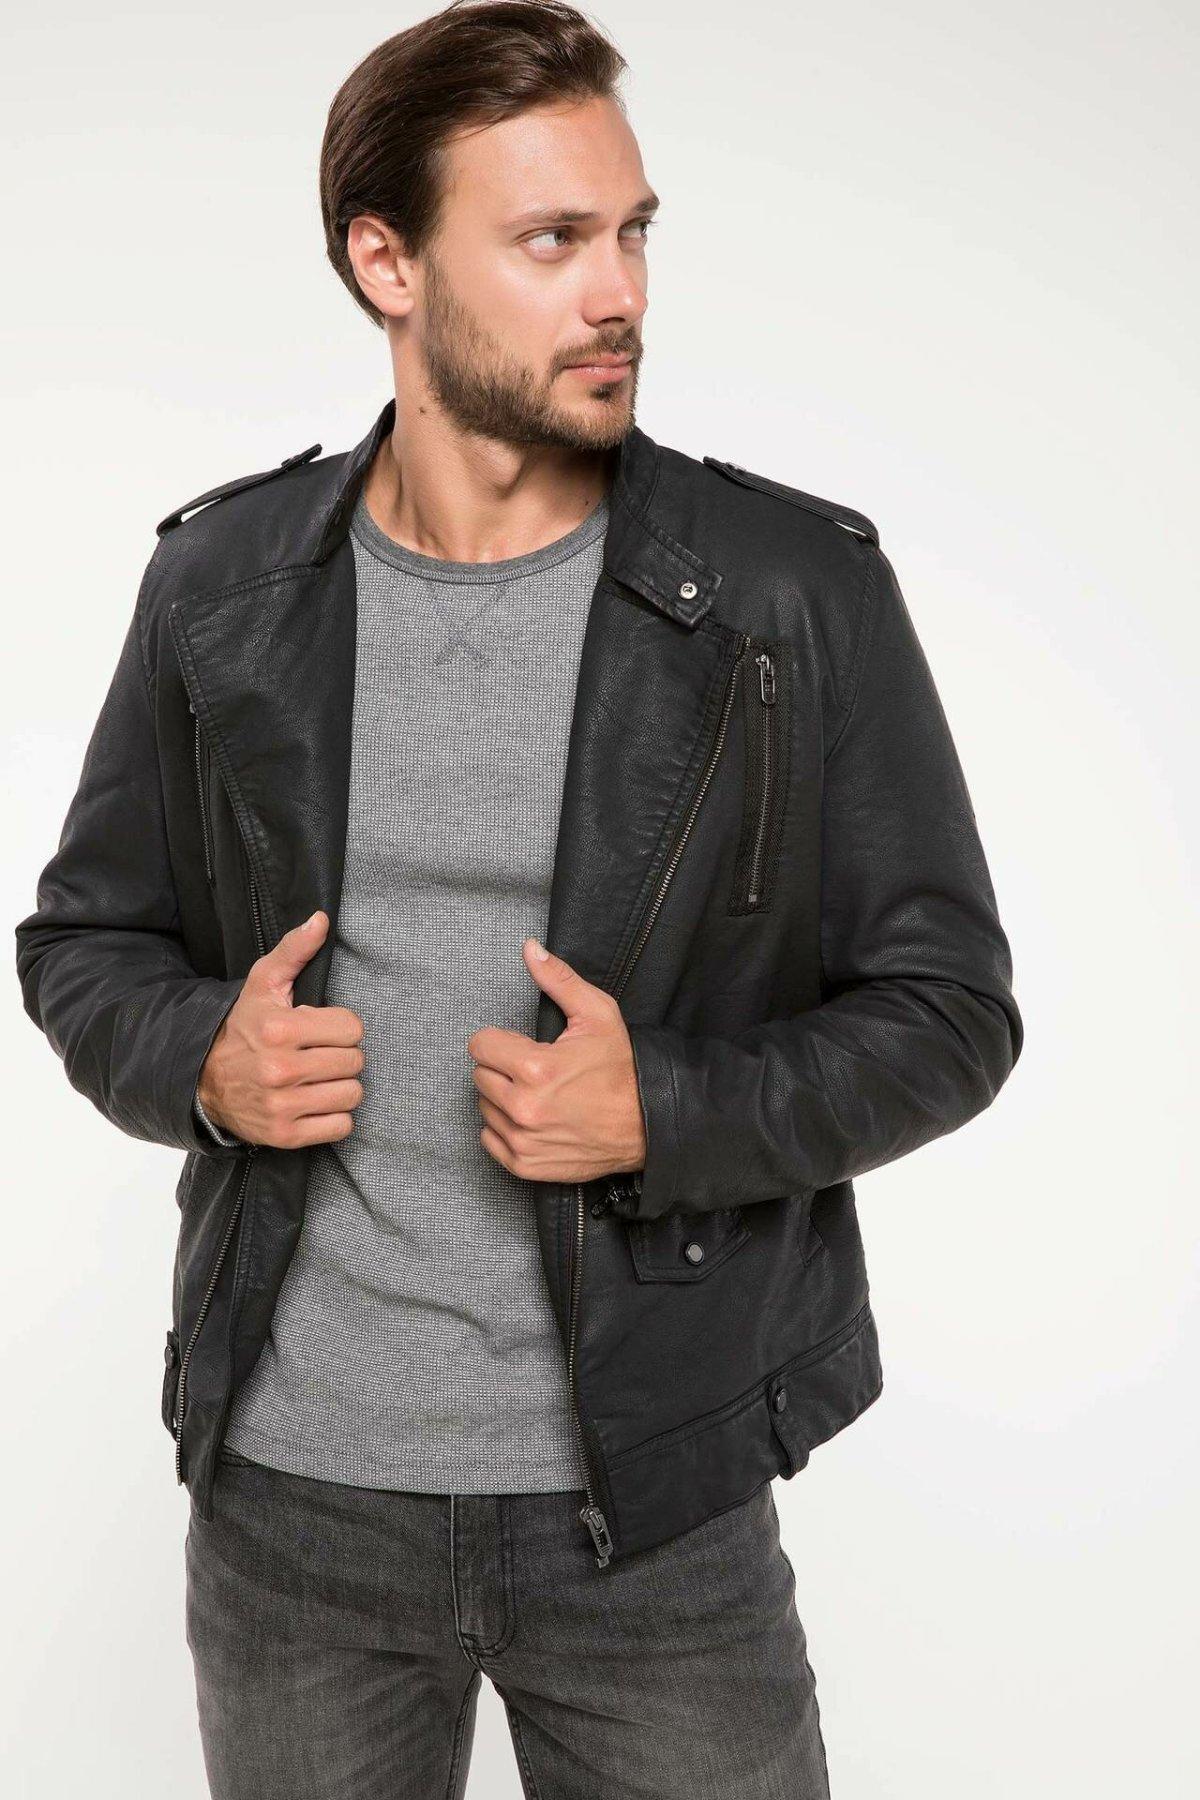 DeFacto Man Fashion Lapel PU Short Jackets For Men's Casual Leather Coats Male Windproof Overcoats Autumn - I7950AZ18AU